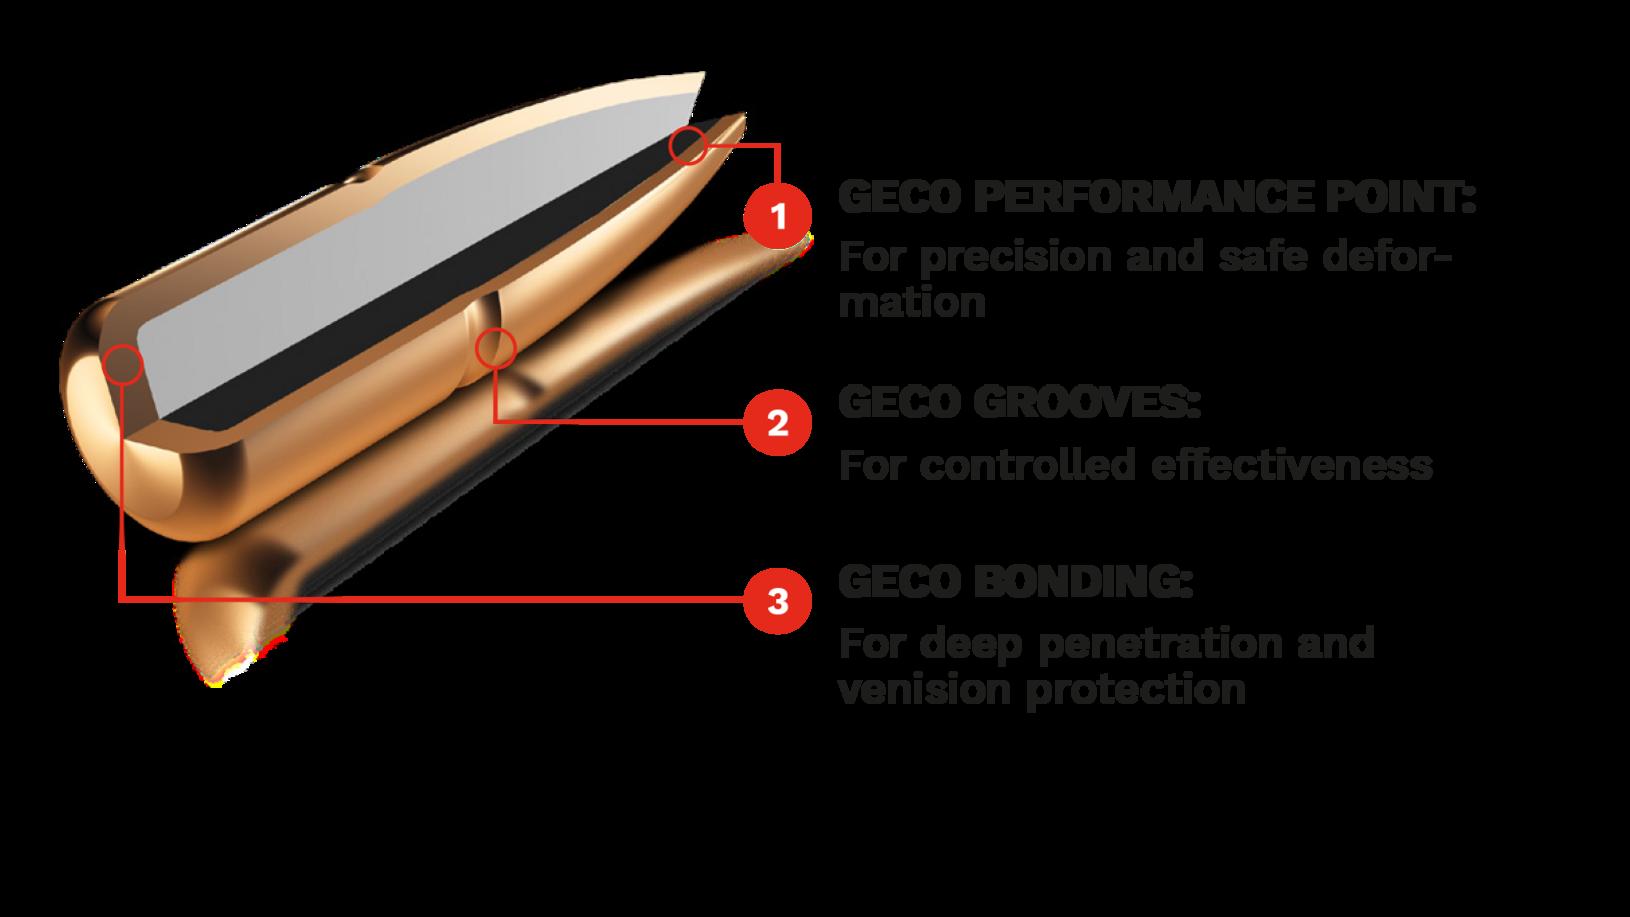 Bullet construction image of GECO PLUS